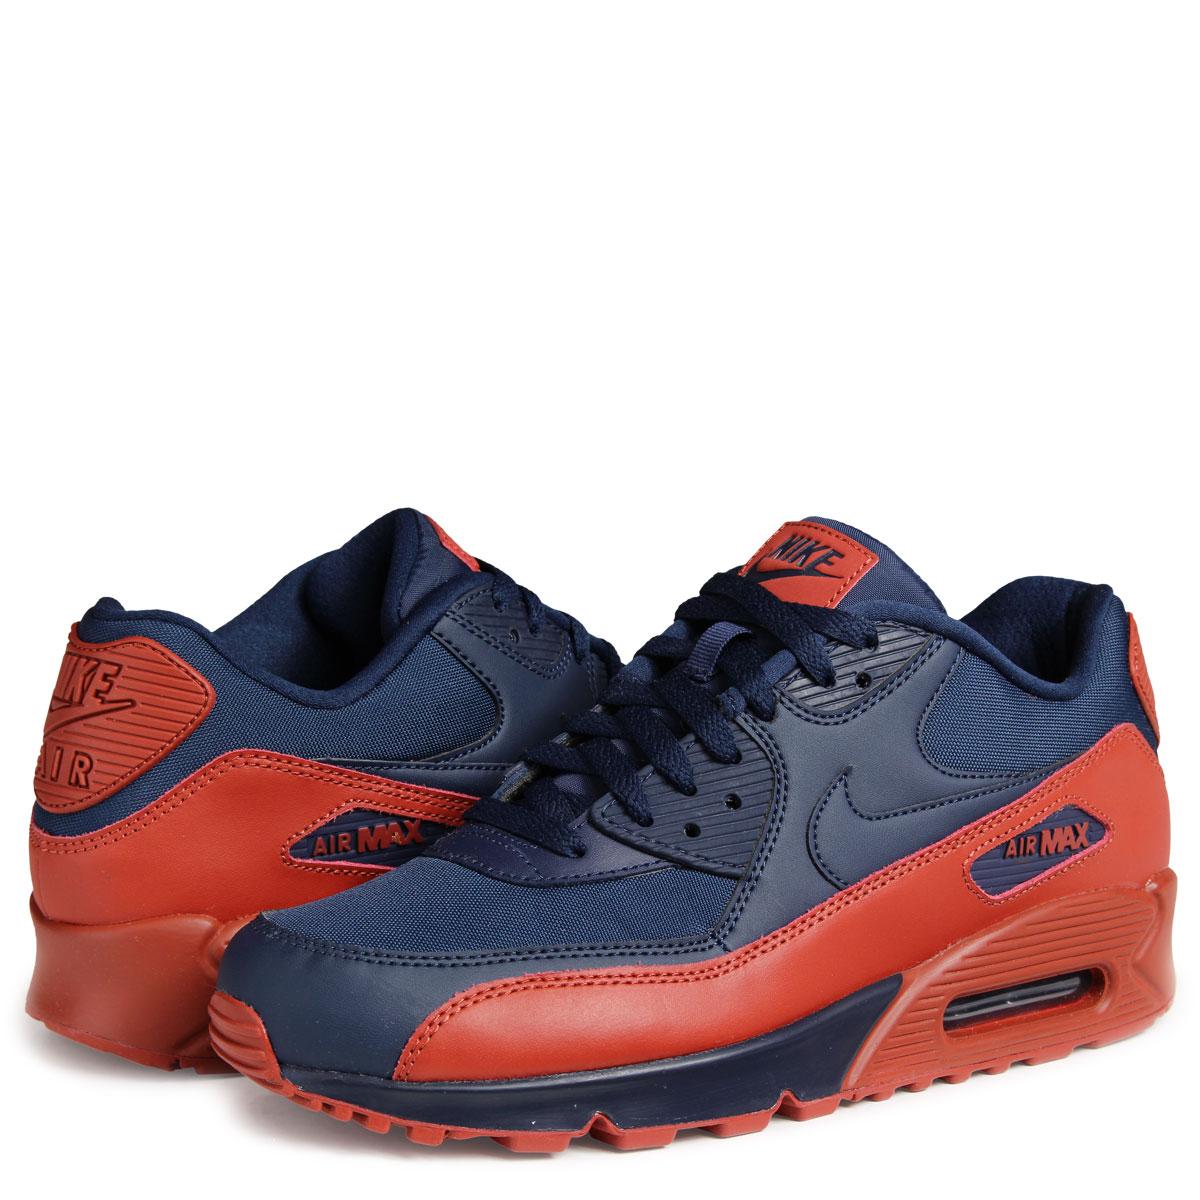 NIKE AIR MAX 90 ESSENTIAL Kie Ney AMAX 90 essential sneakers 537,384 425 men's shoes navy